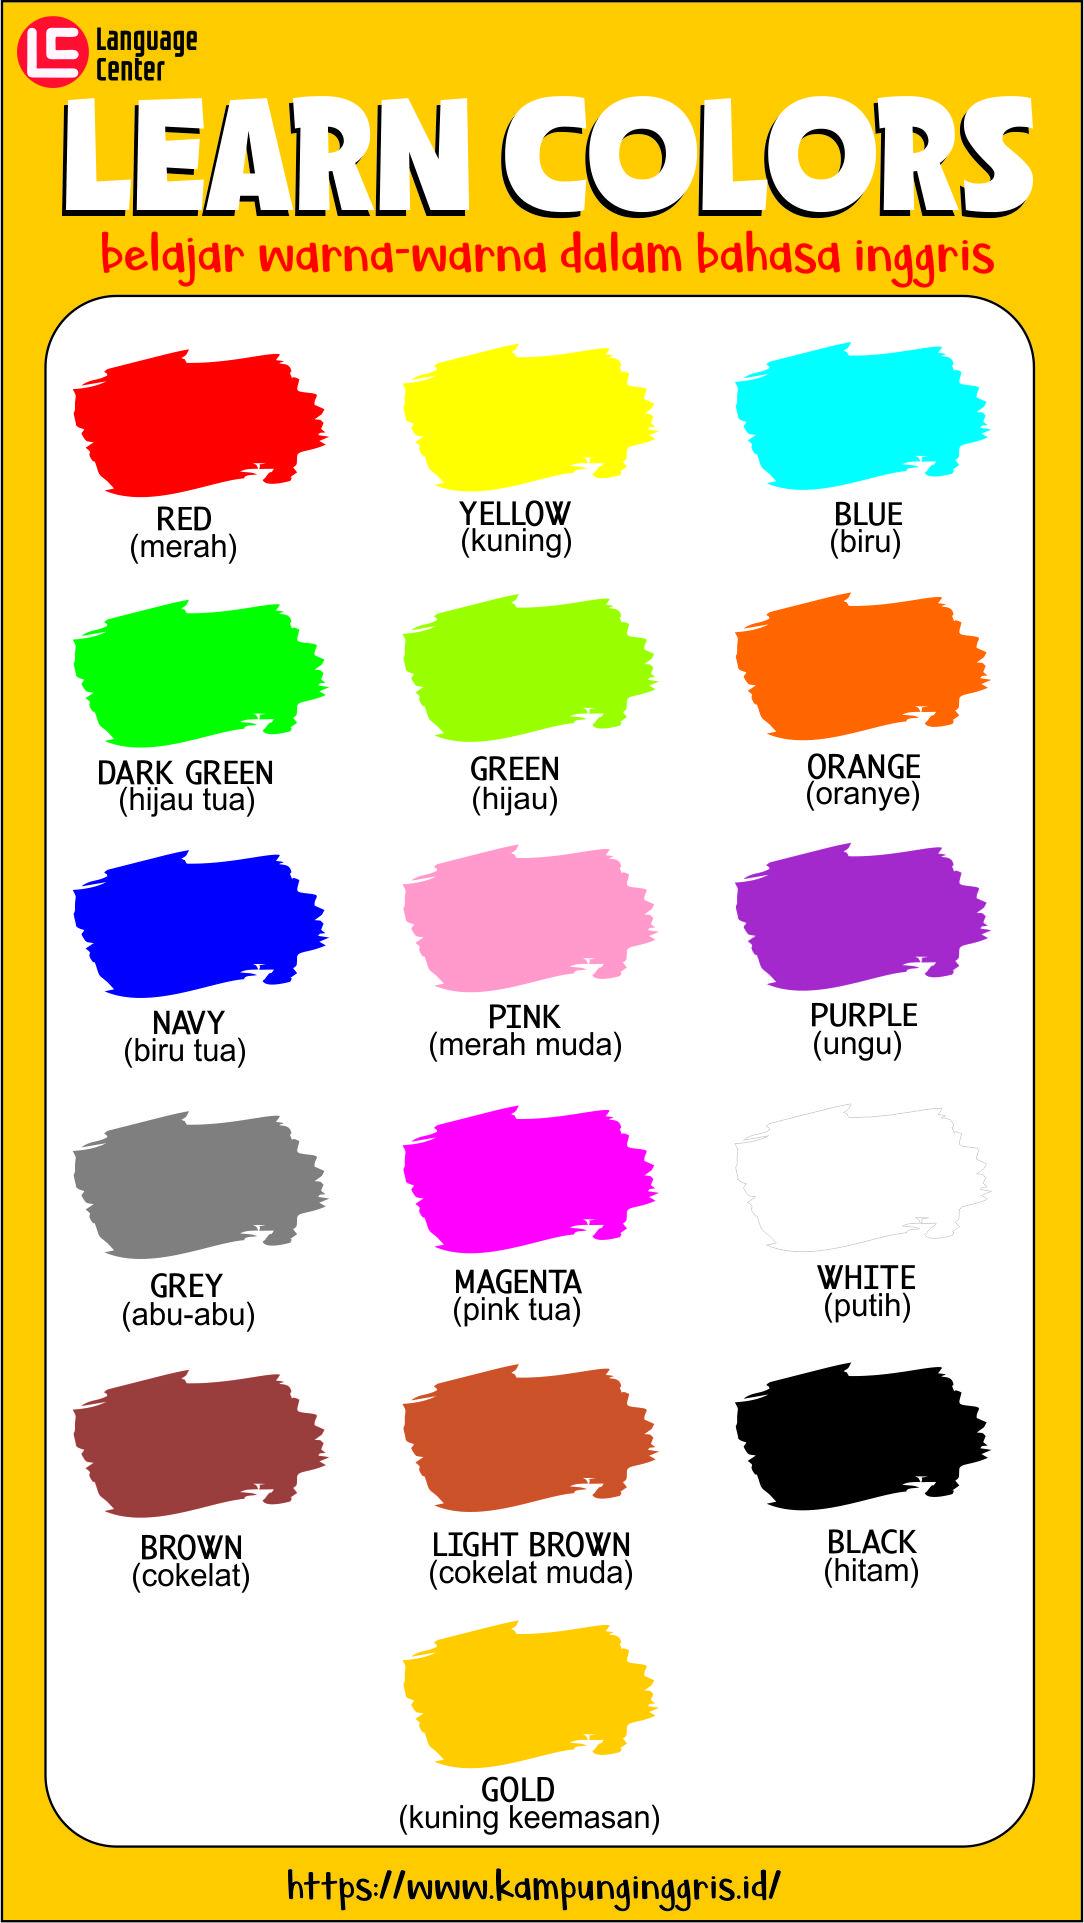 Nama-Nama Warna dalam Bahasa Inggris dan Contoh Percakapan